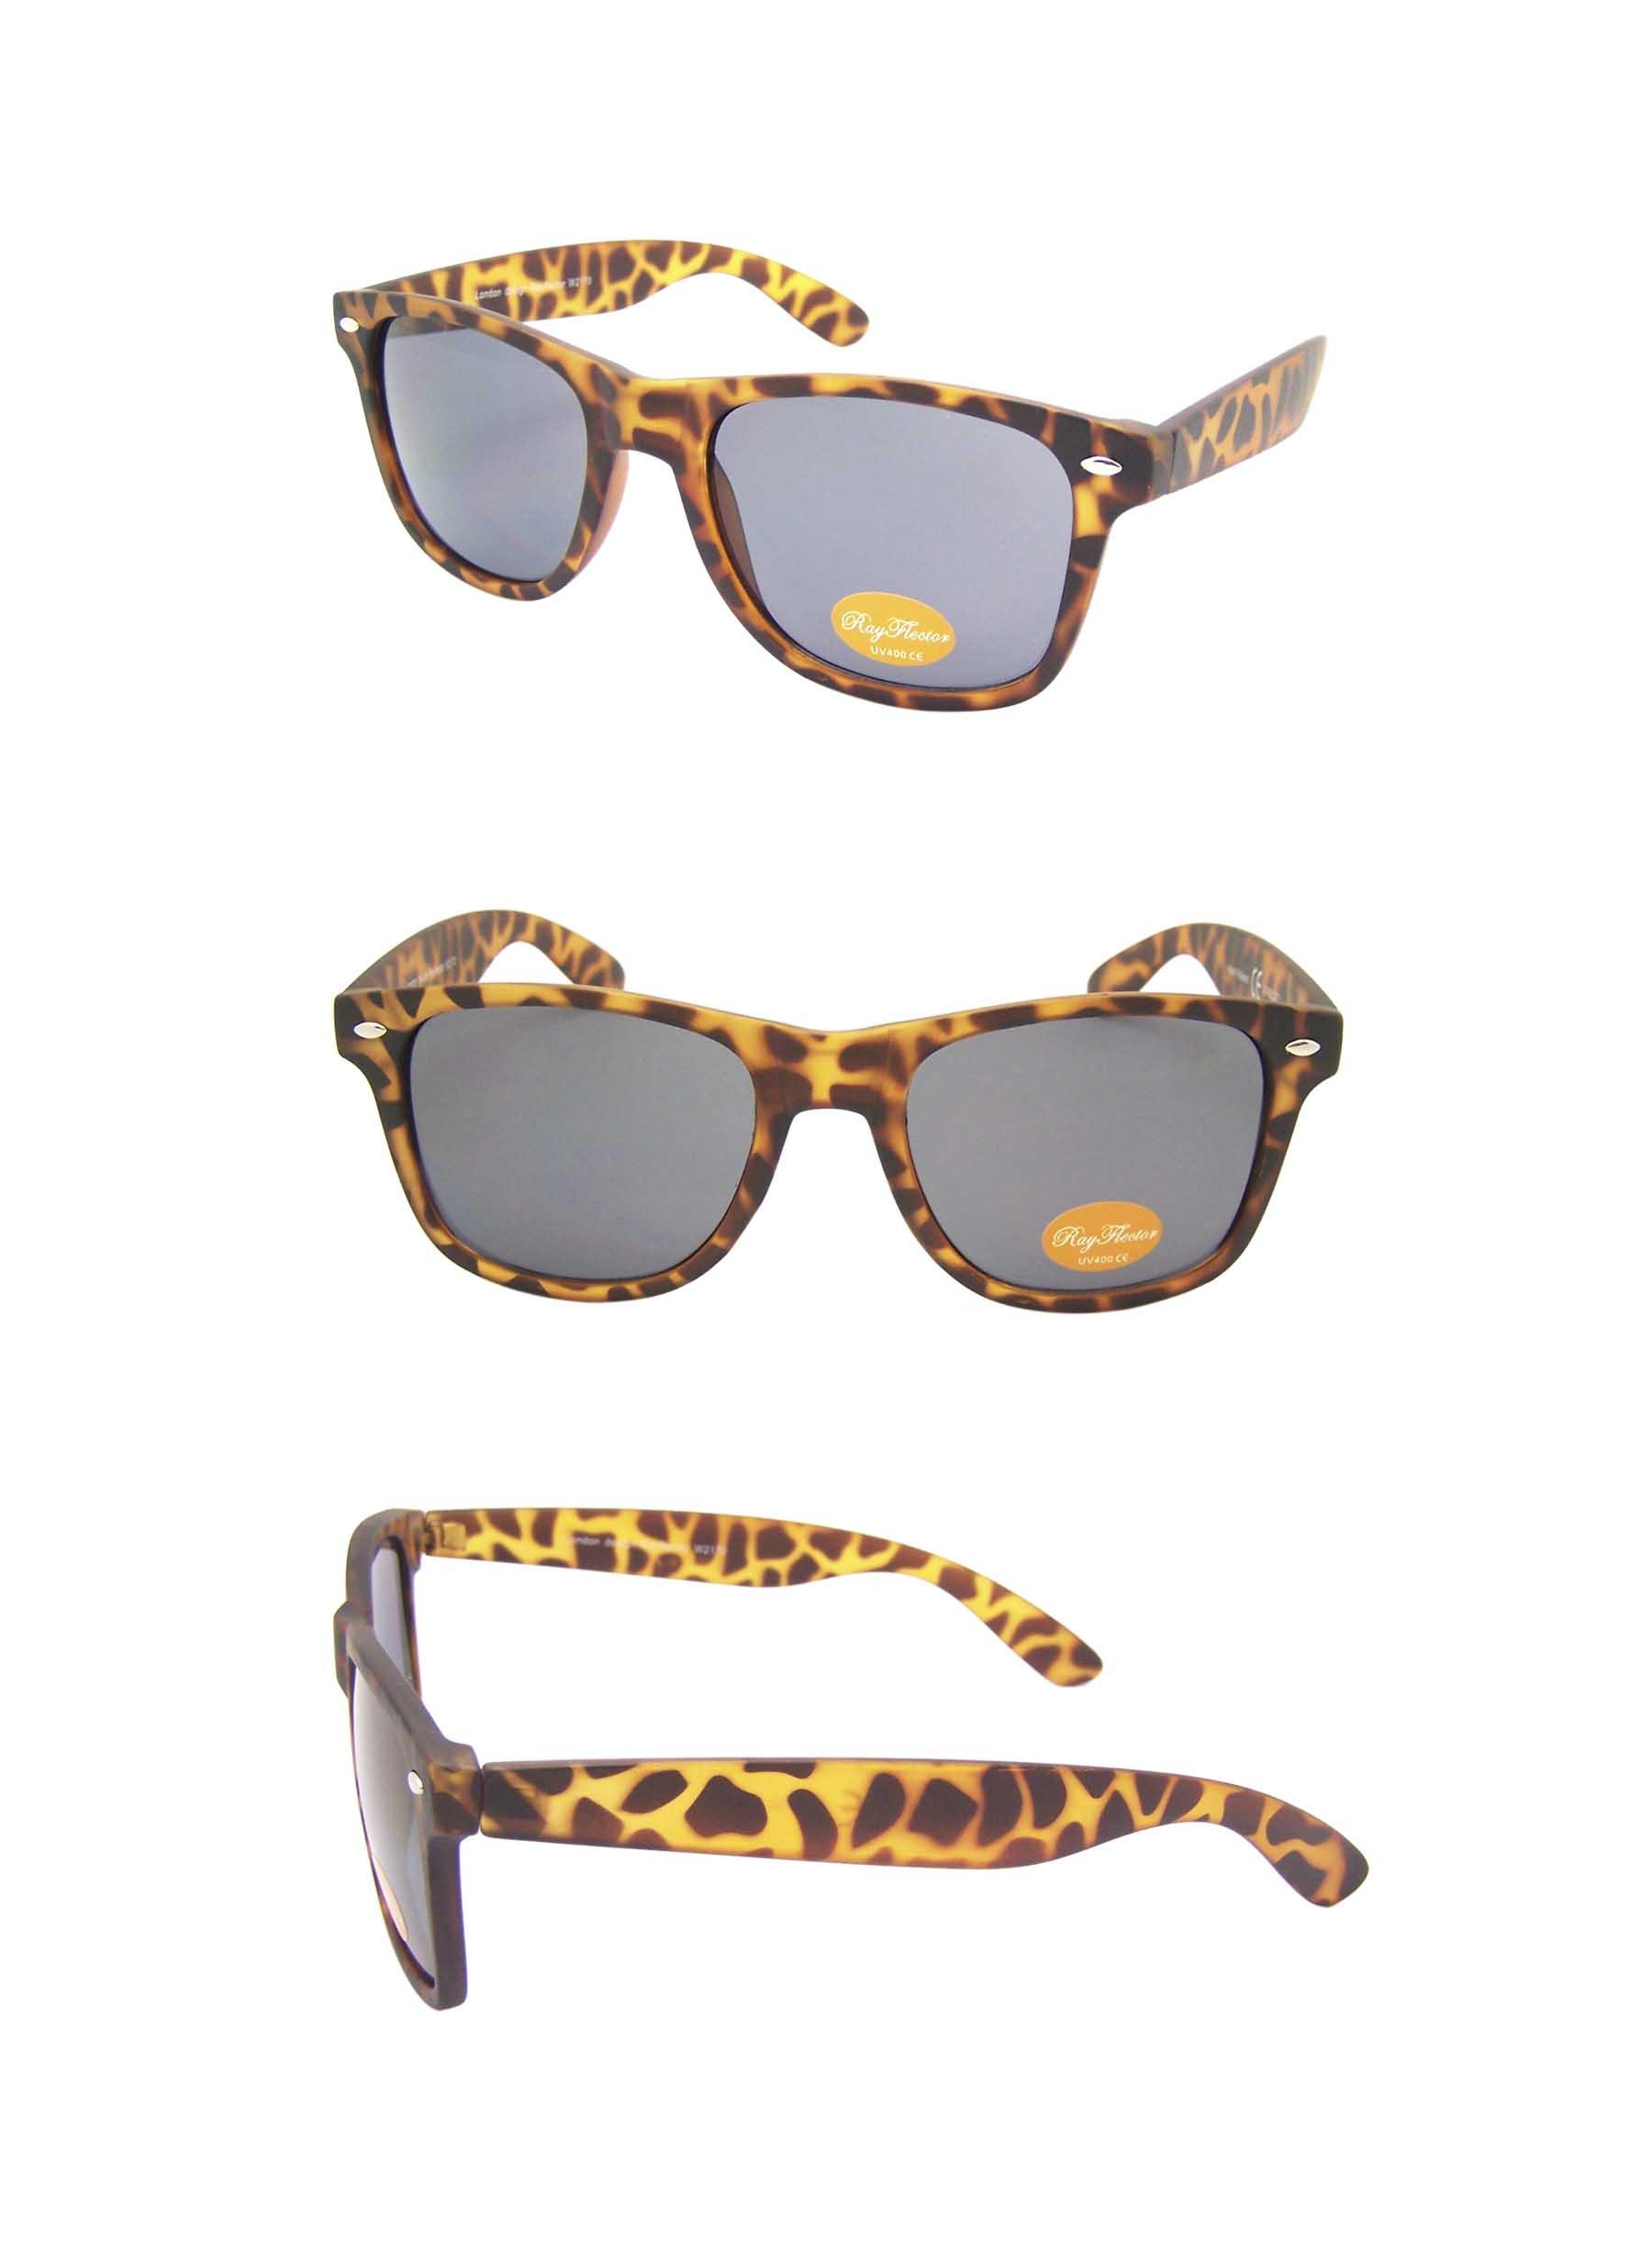 73bcc1528fec fashion sunglasses